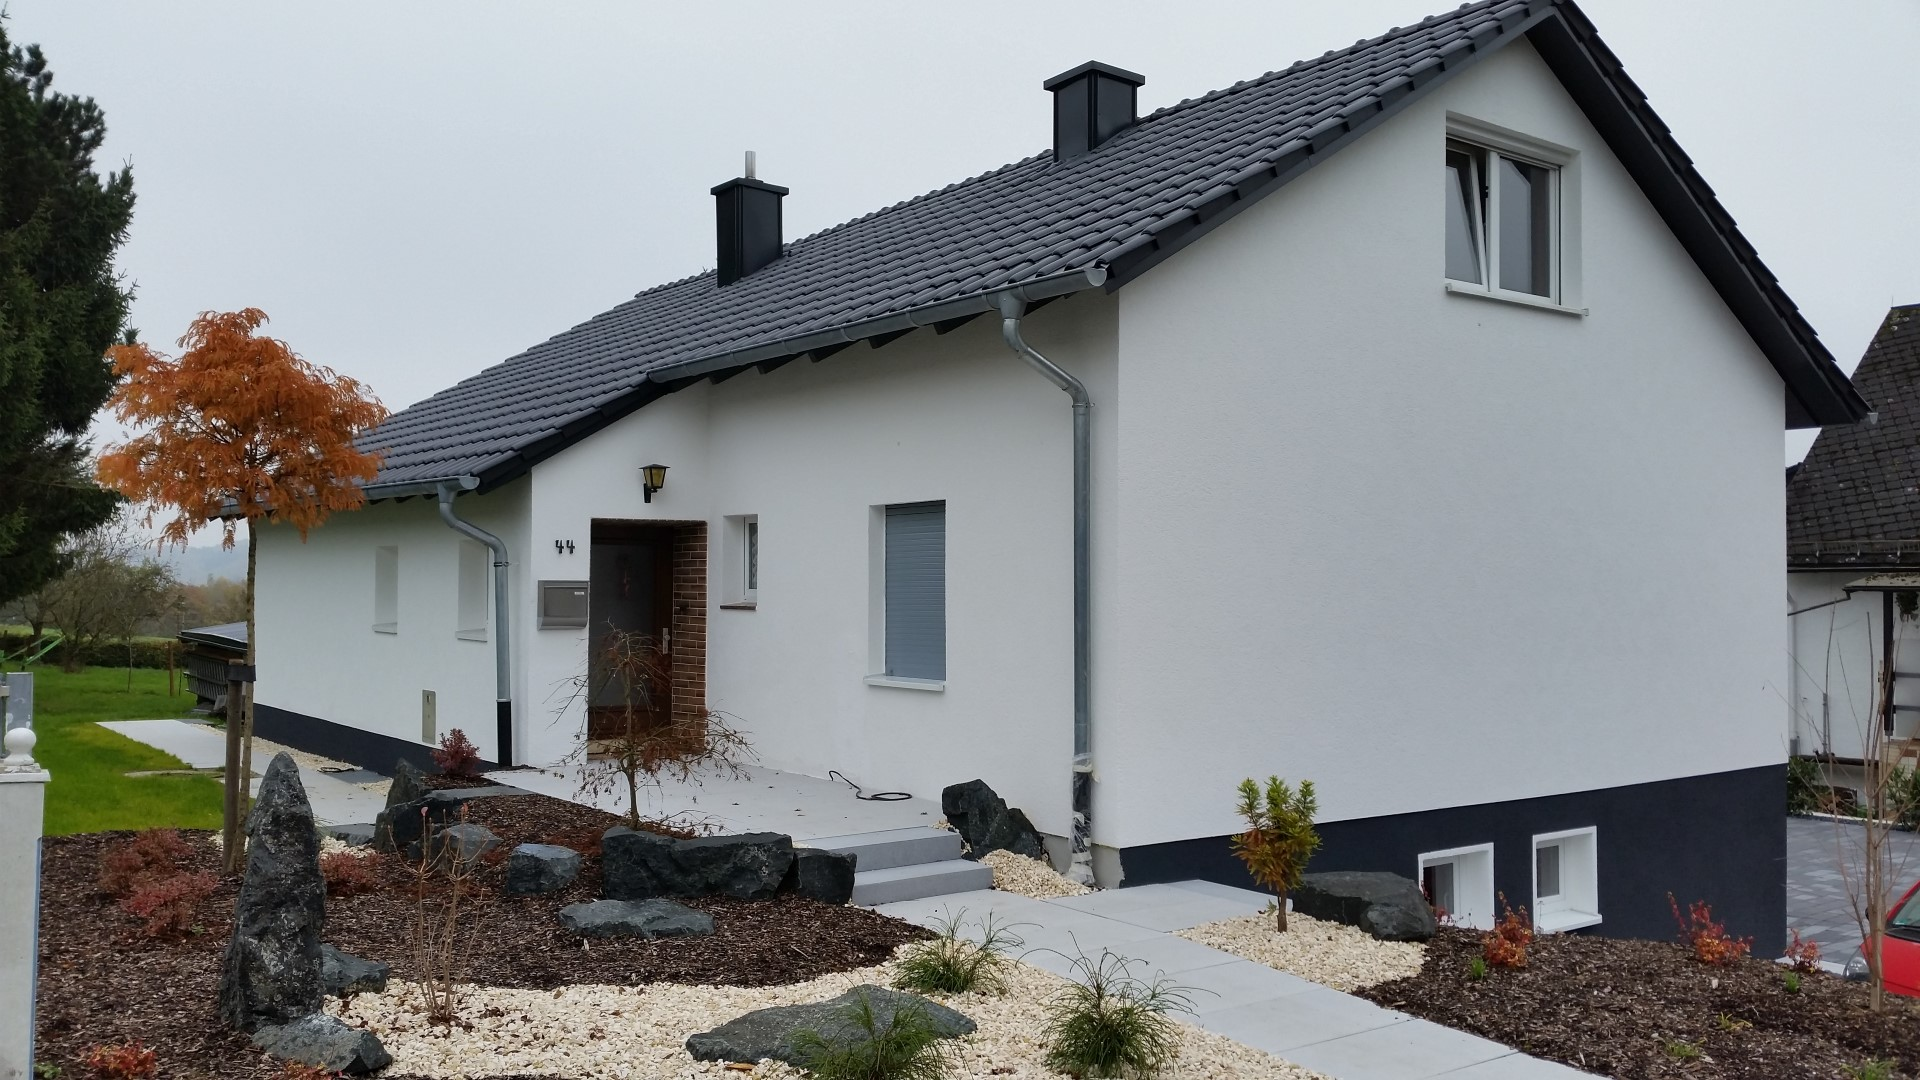 Dachsanierung-1-Flammersbach-2